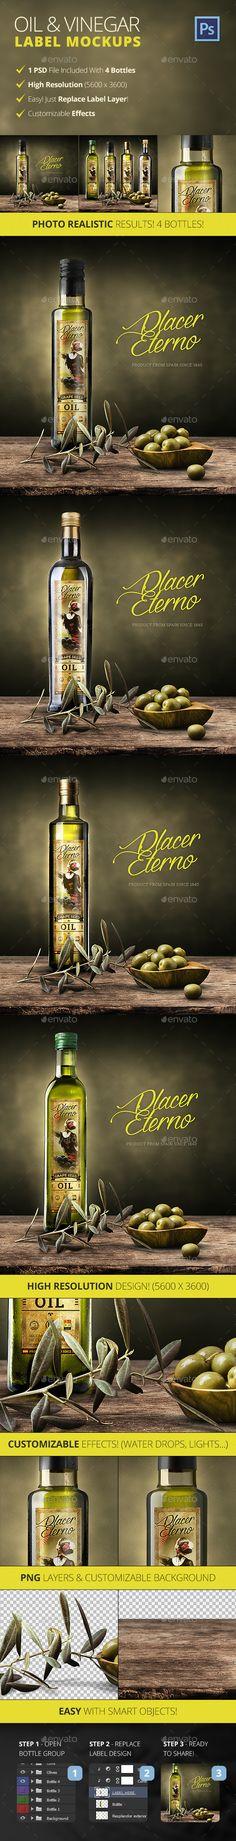 Olive Oil And Vinegar Bottle Label Mockup — Photoshop PSD #render #packaging • Available here → https://graphicriver.net/item/olive-oil-and-vinegar-bottle-label-mockup/12817024?ref=pxcr